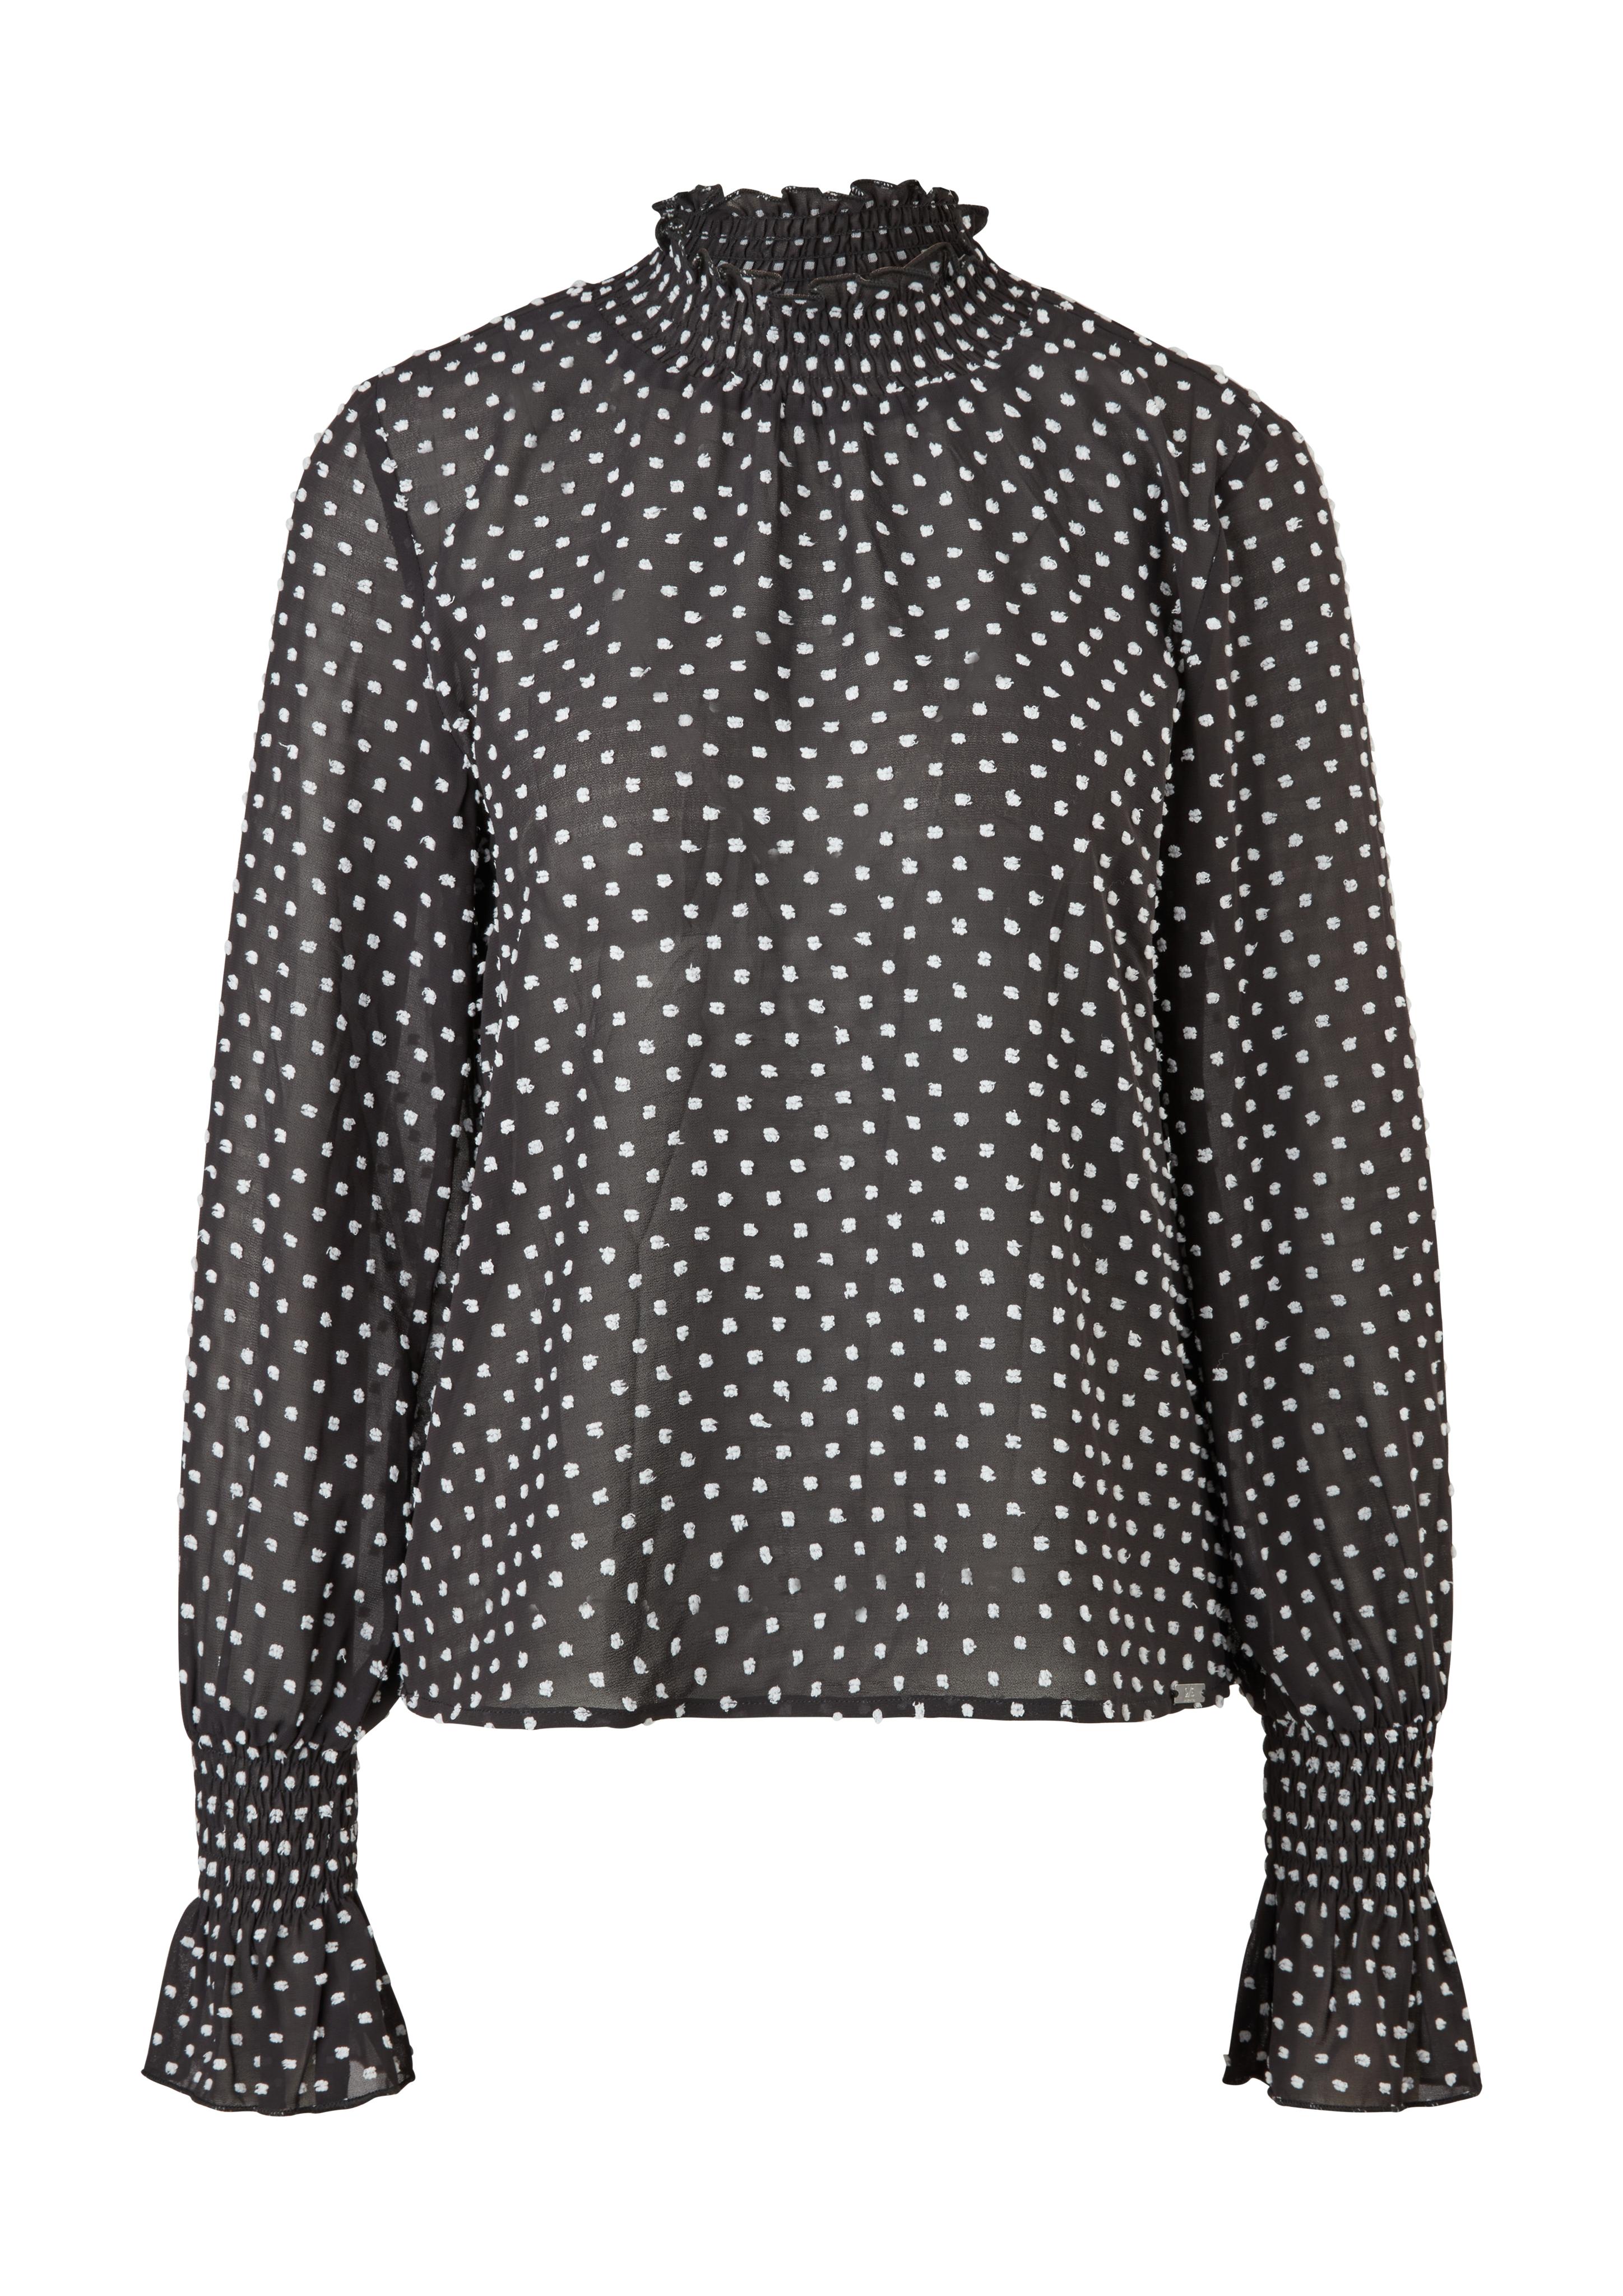 Bluse QS-designed, gepunktet